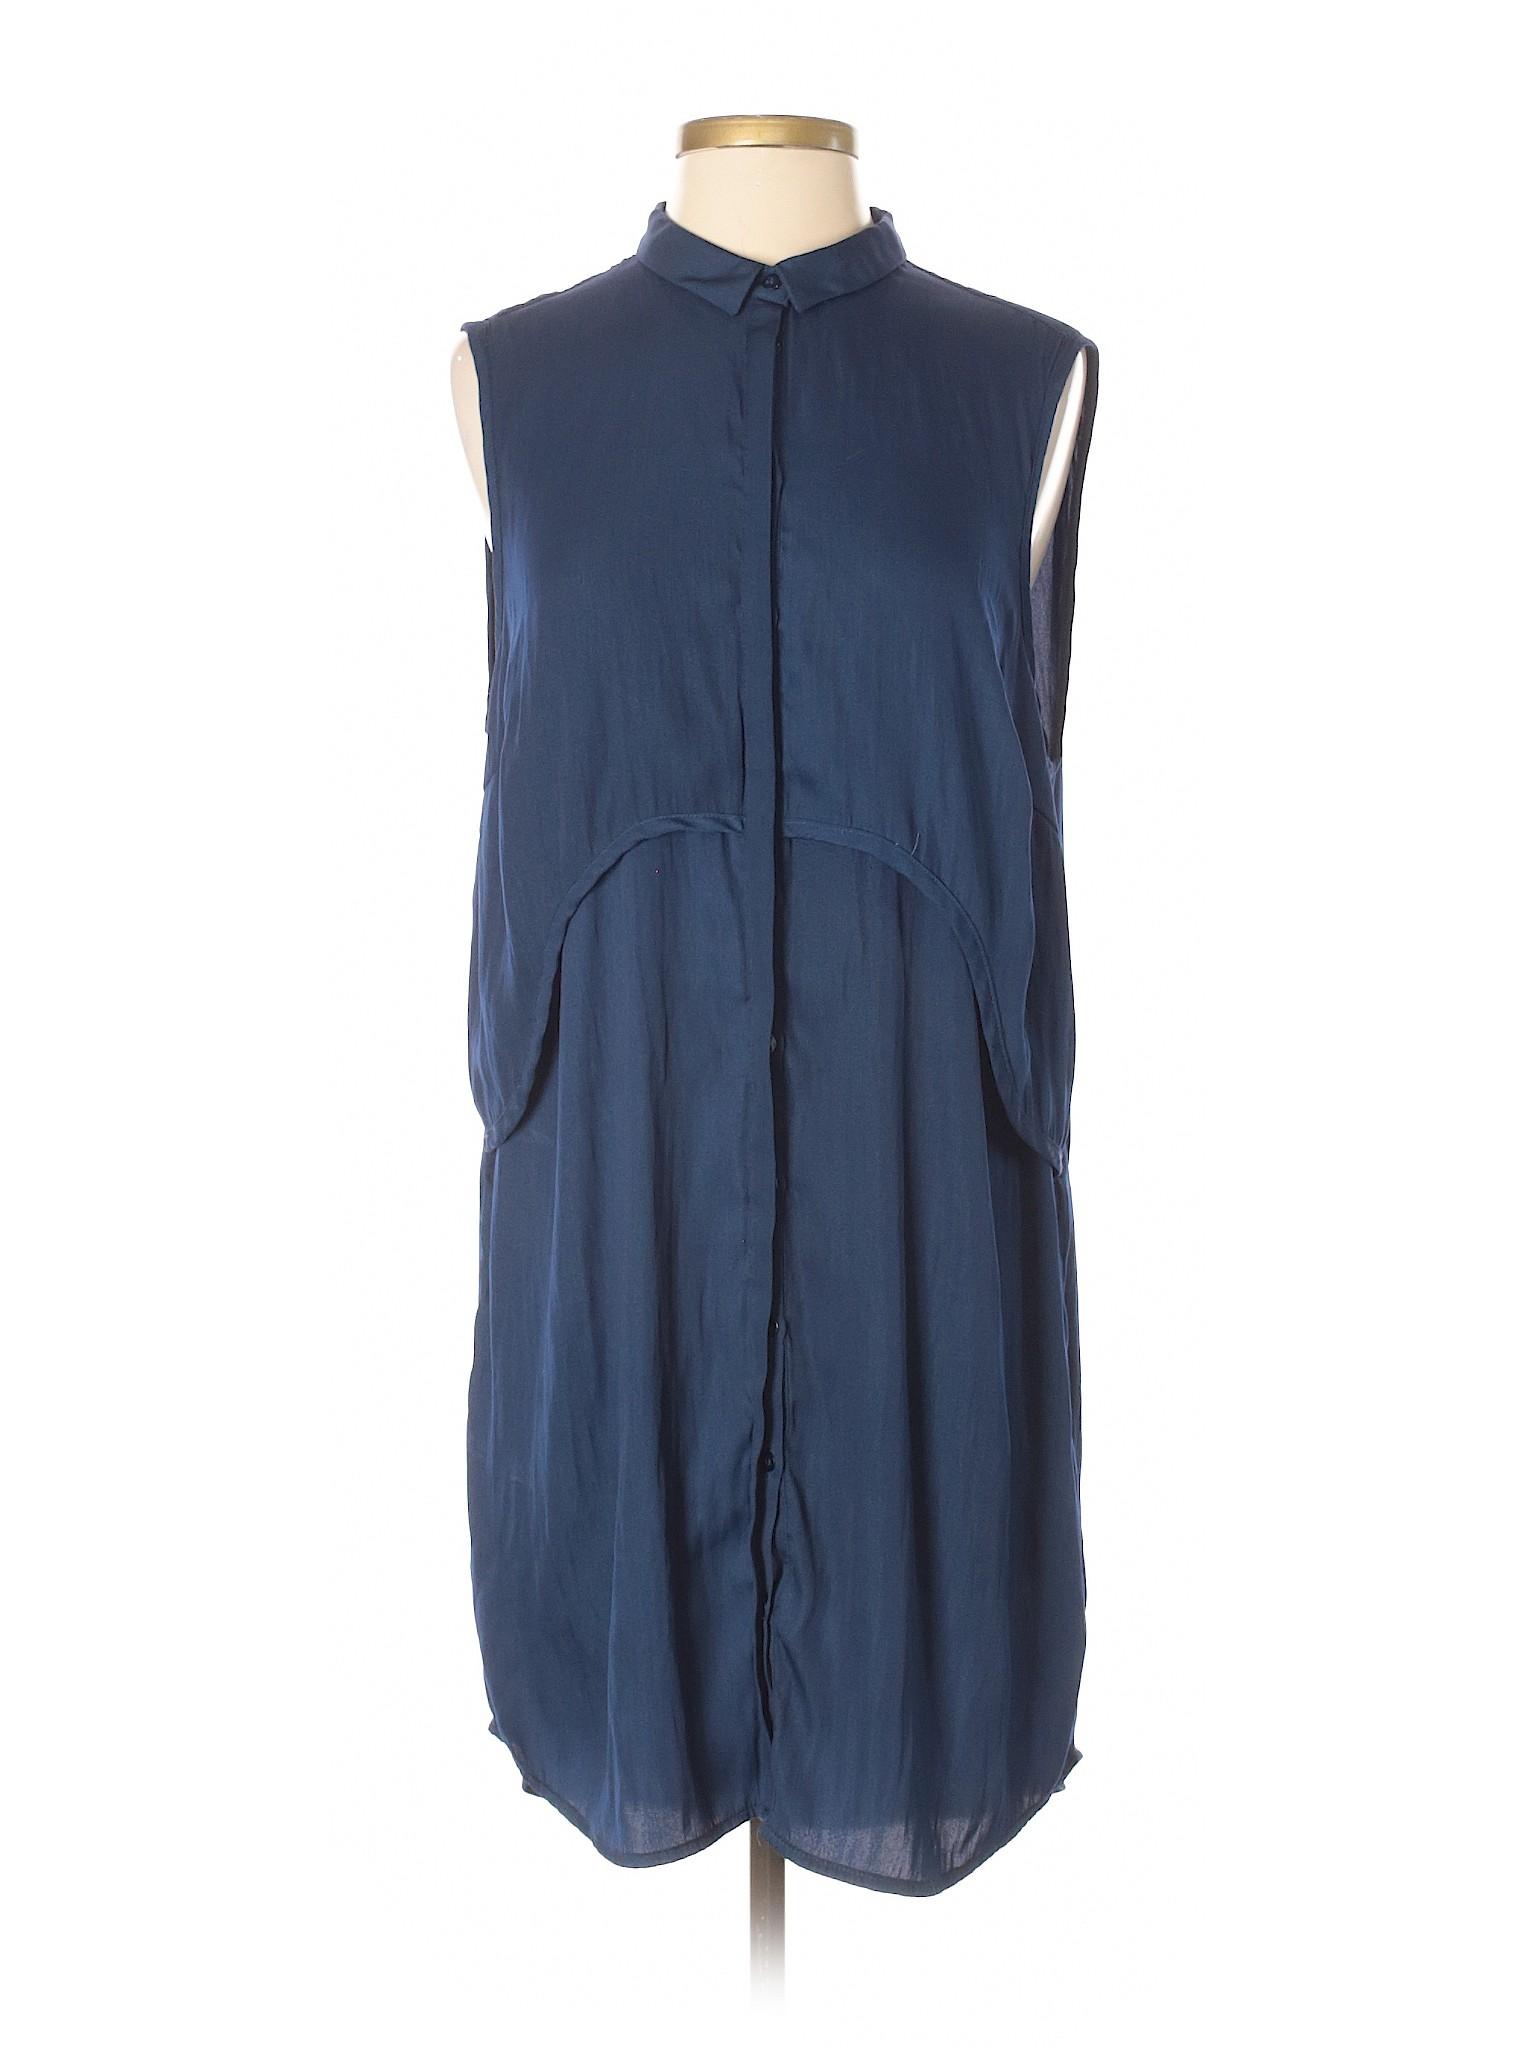 Selling Selling Selling Dress Carmakoma Casual Dress Dress Casual Selling Carmakoma Carmakoma Carmakoma Casual Casual 4WvFTxq5